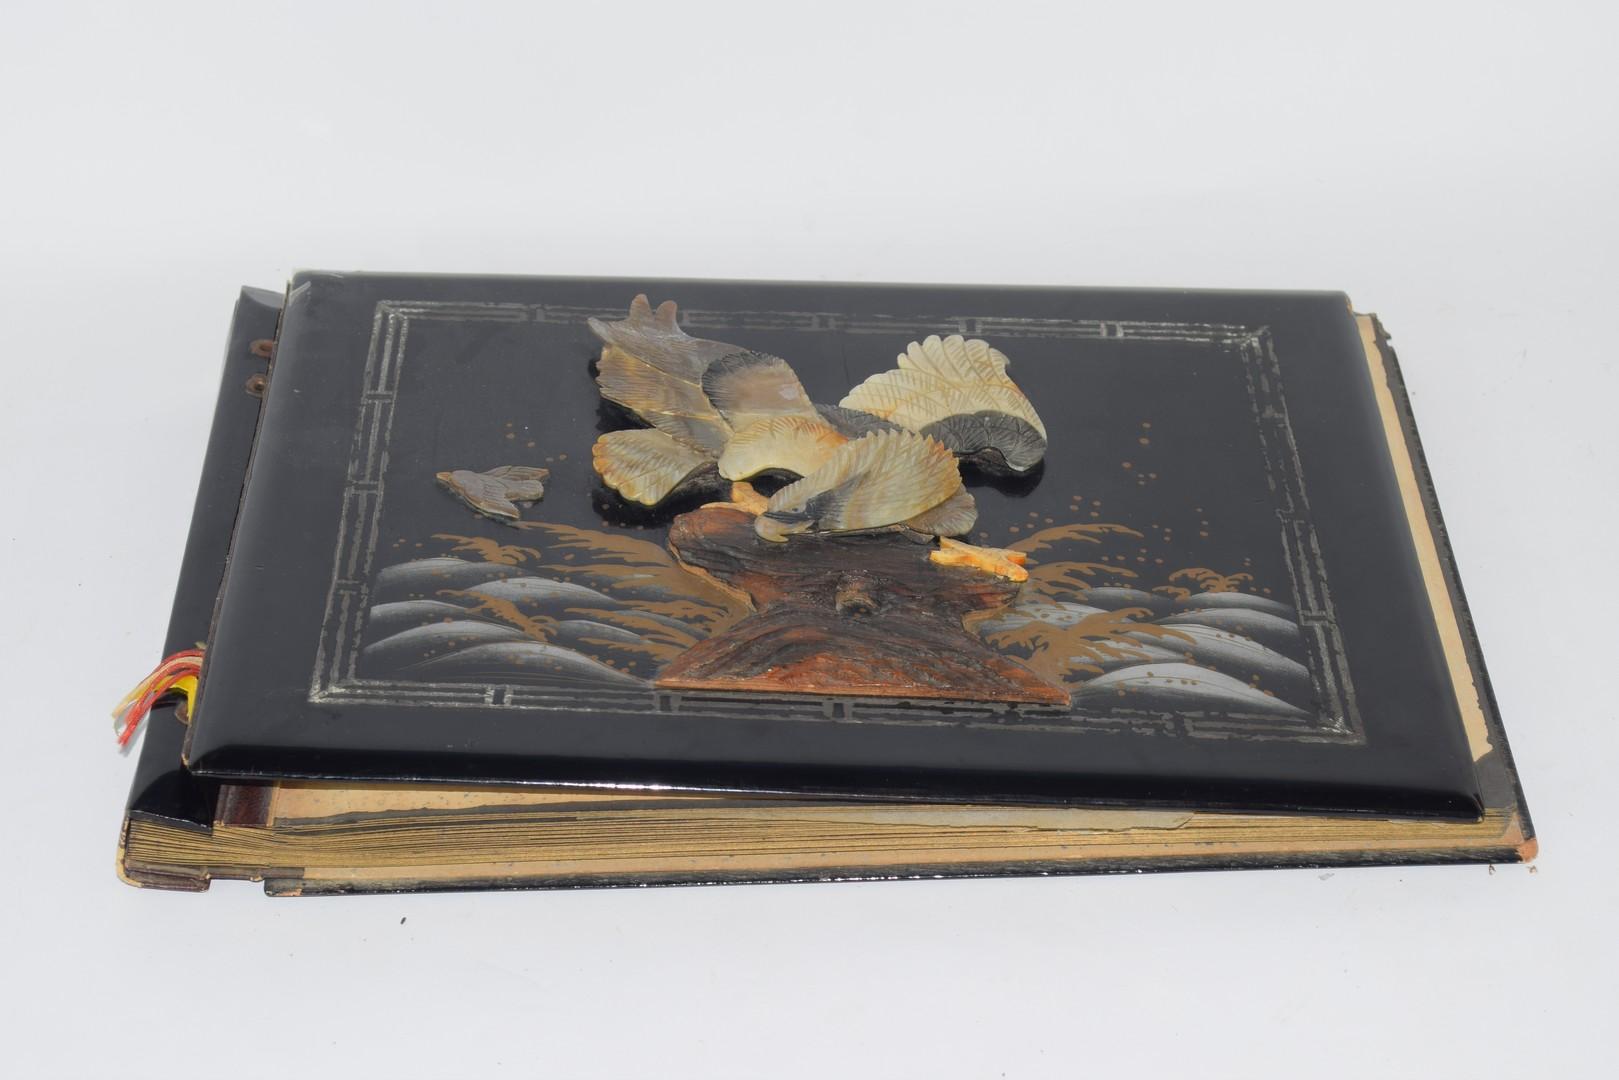 1930s Oriental lacquer photograph album - Image 2 of 3